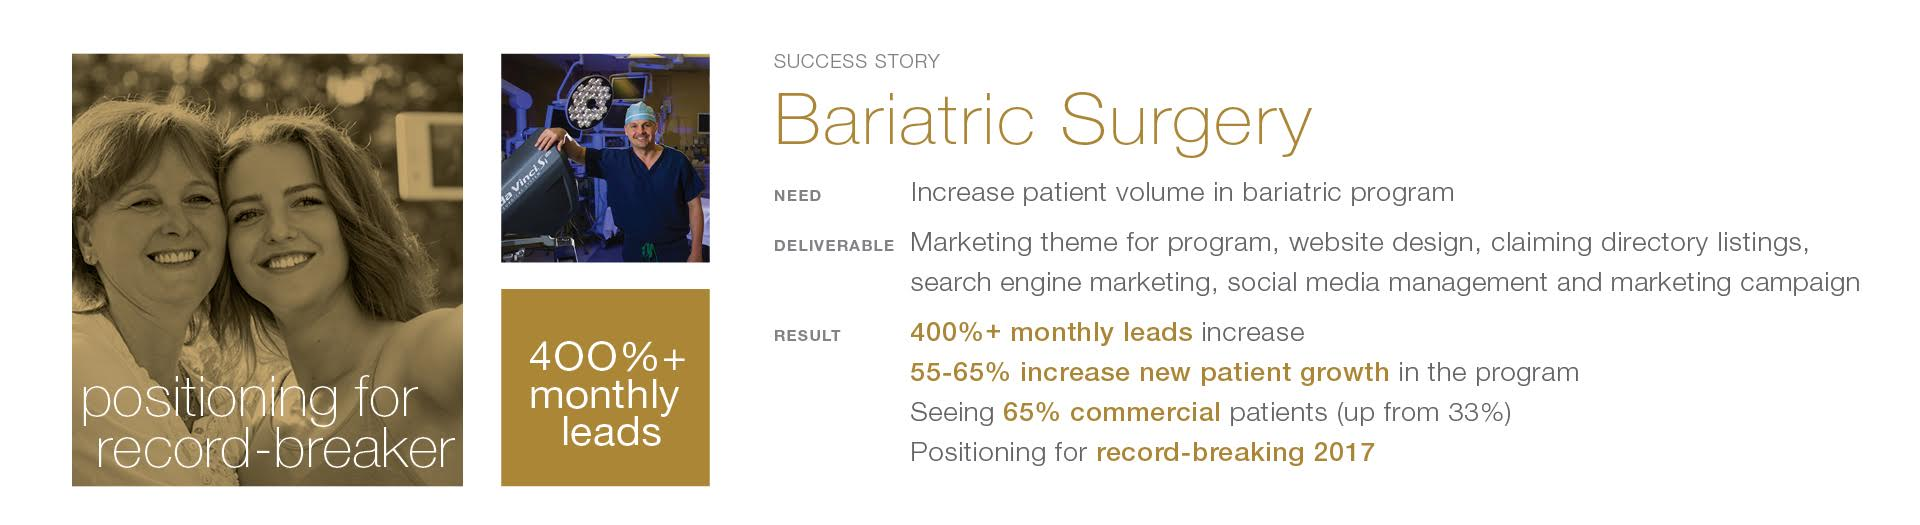 bariatric-surgery